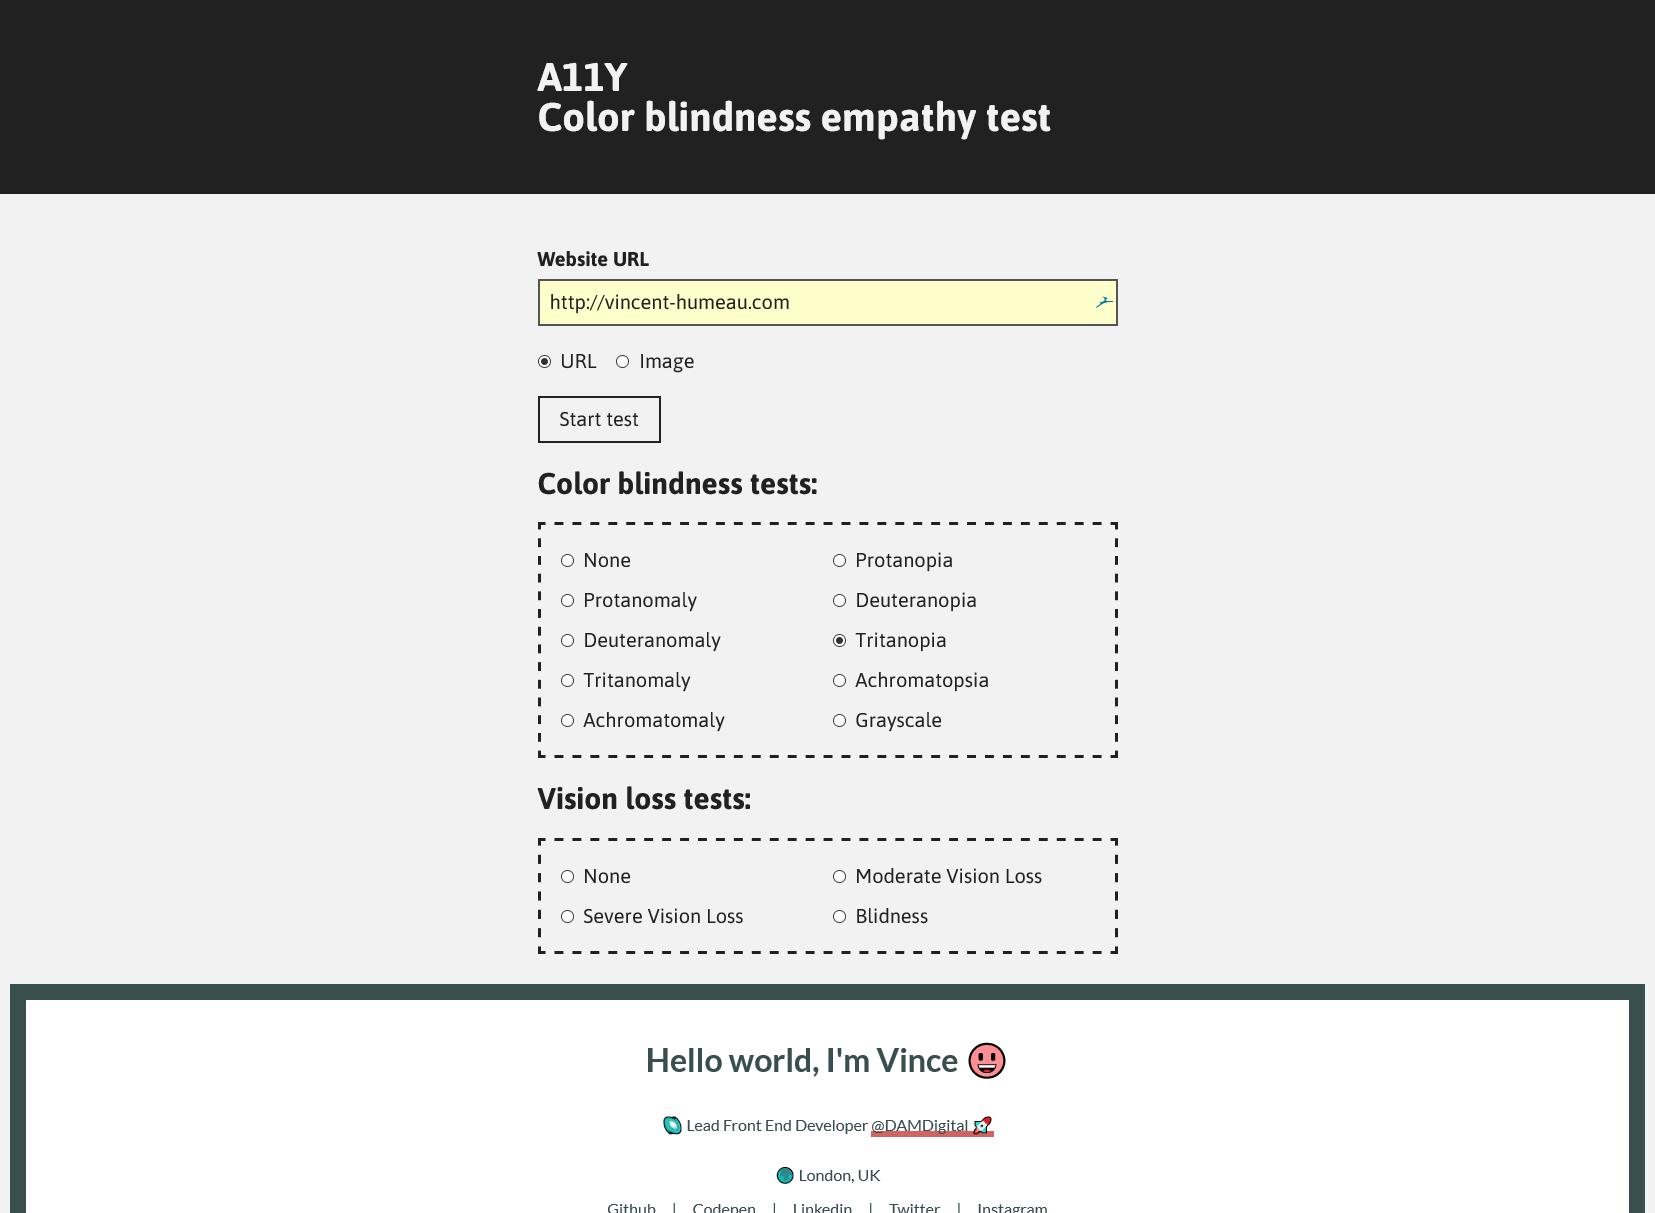 Screenshot of A11Y Color Blindness Empathy Test